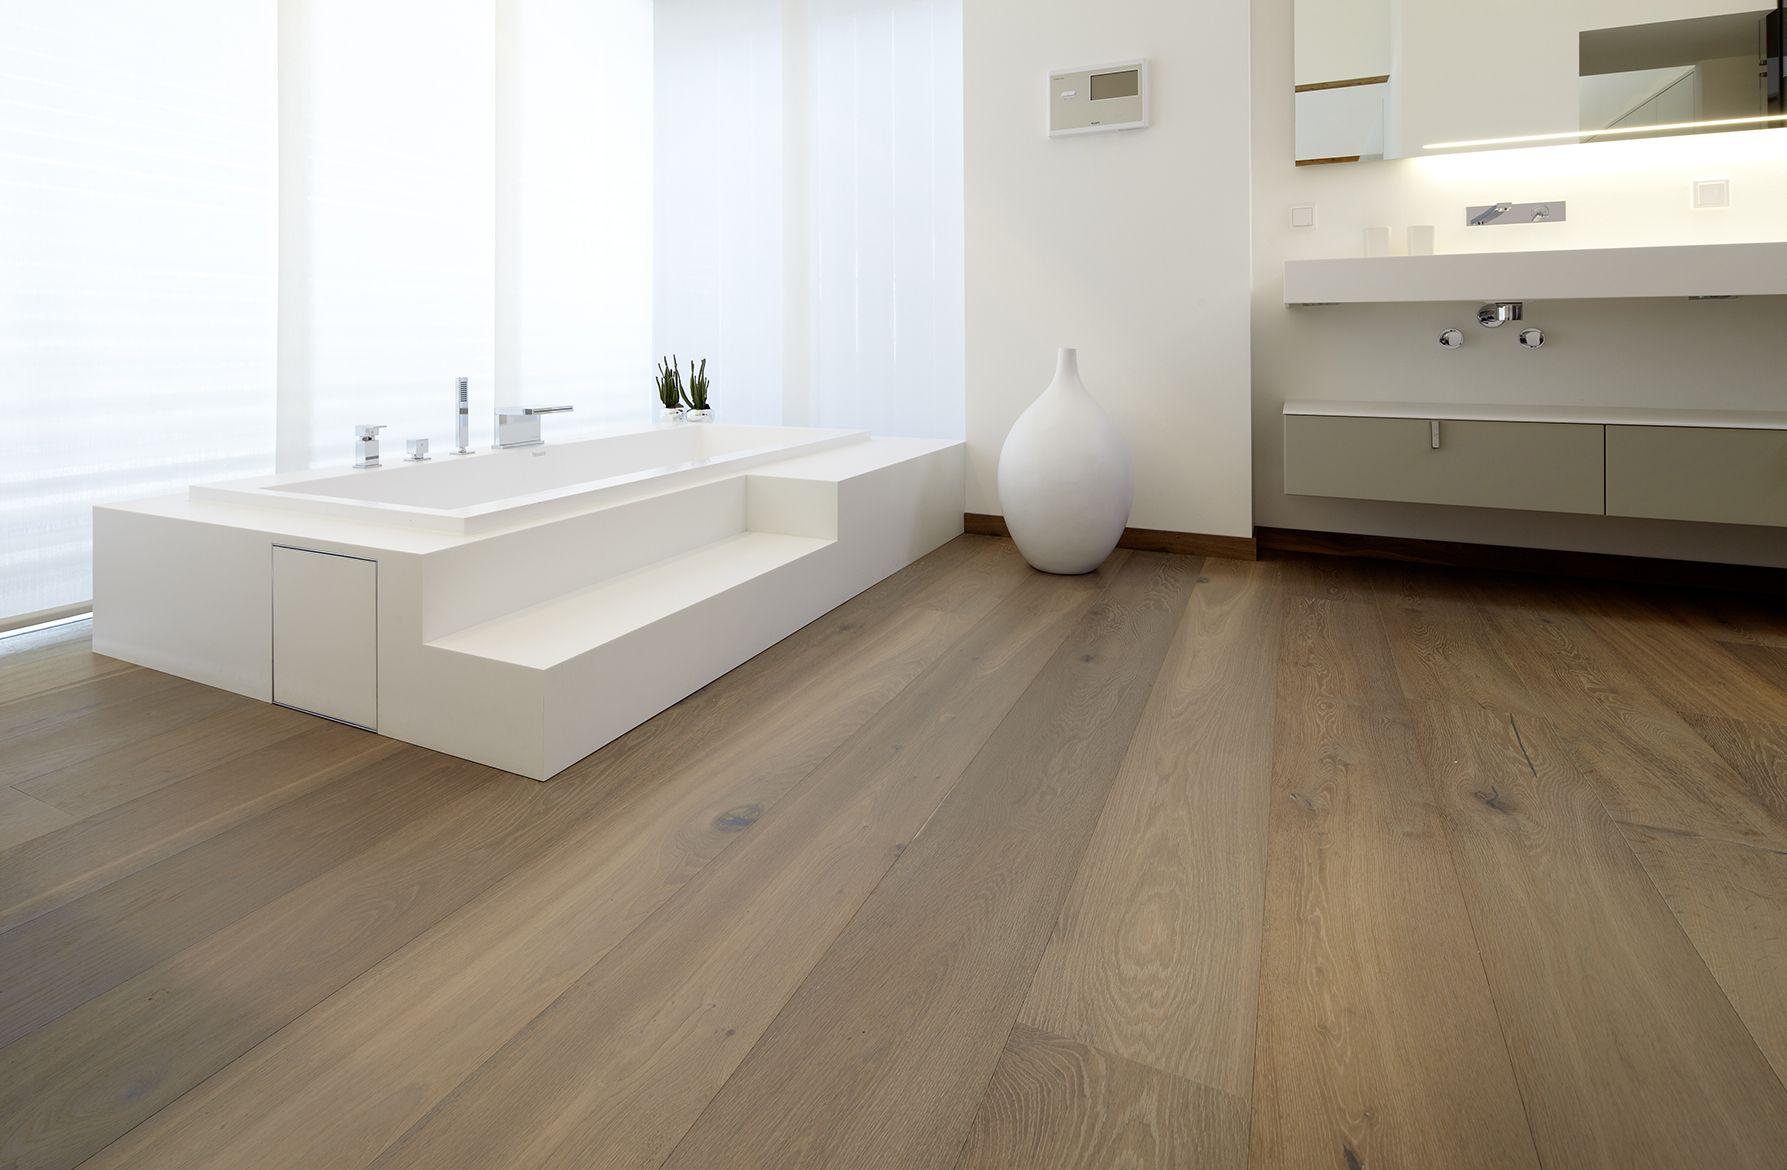 Badezimmer Holz Brown White Parkett Stilvoll Bathroom Bathtub